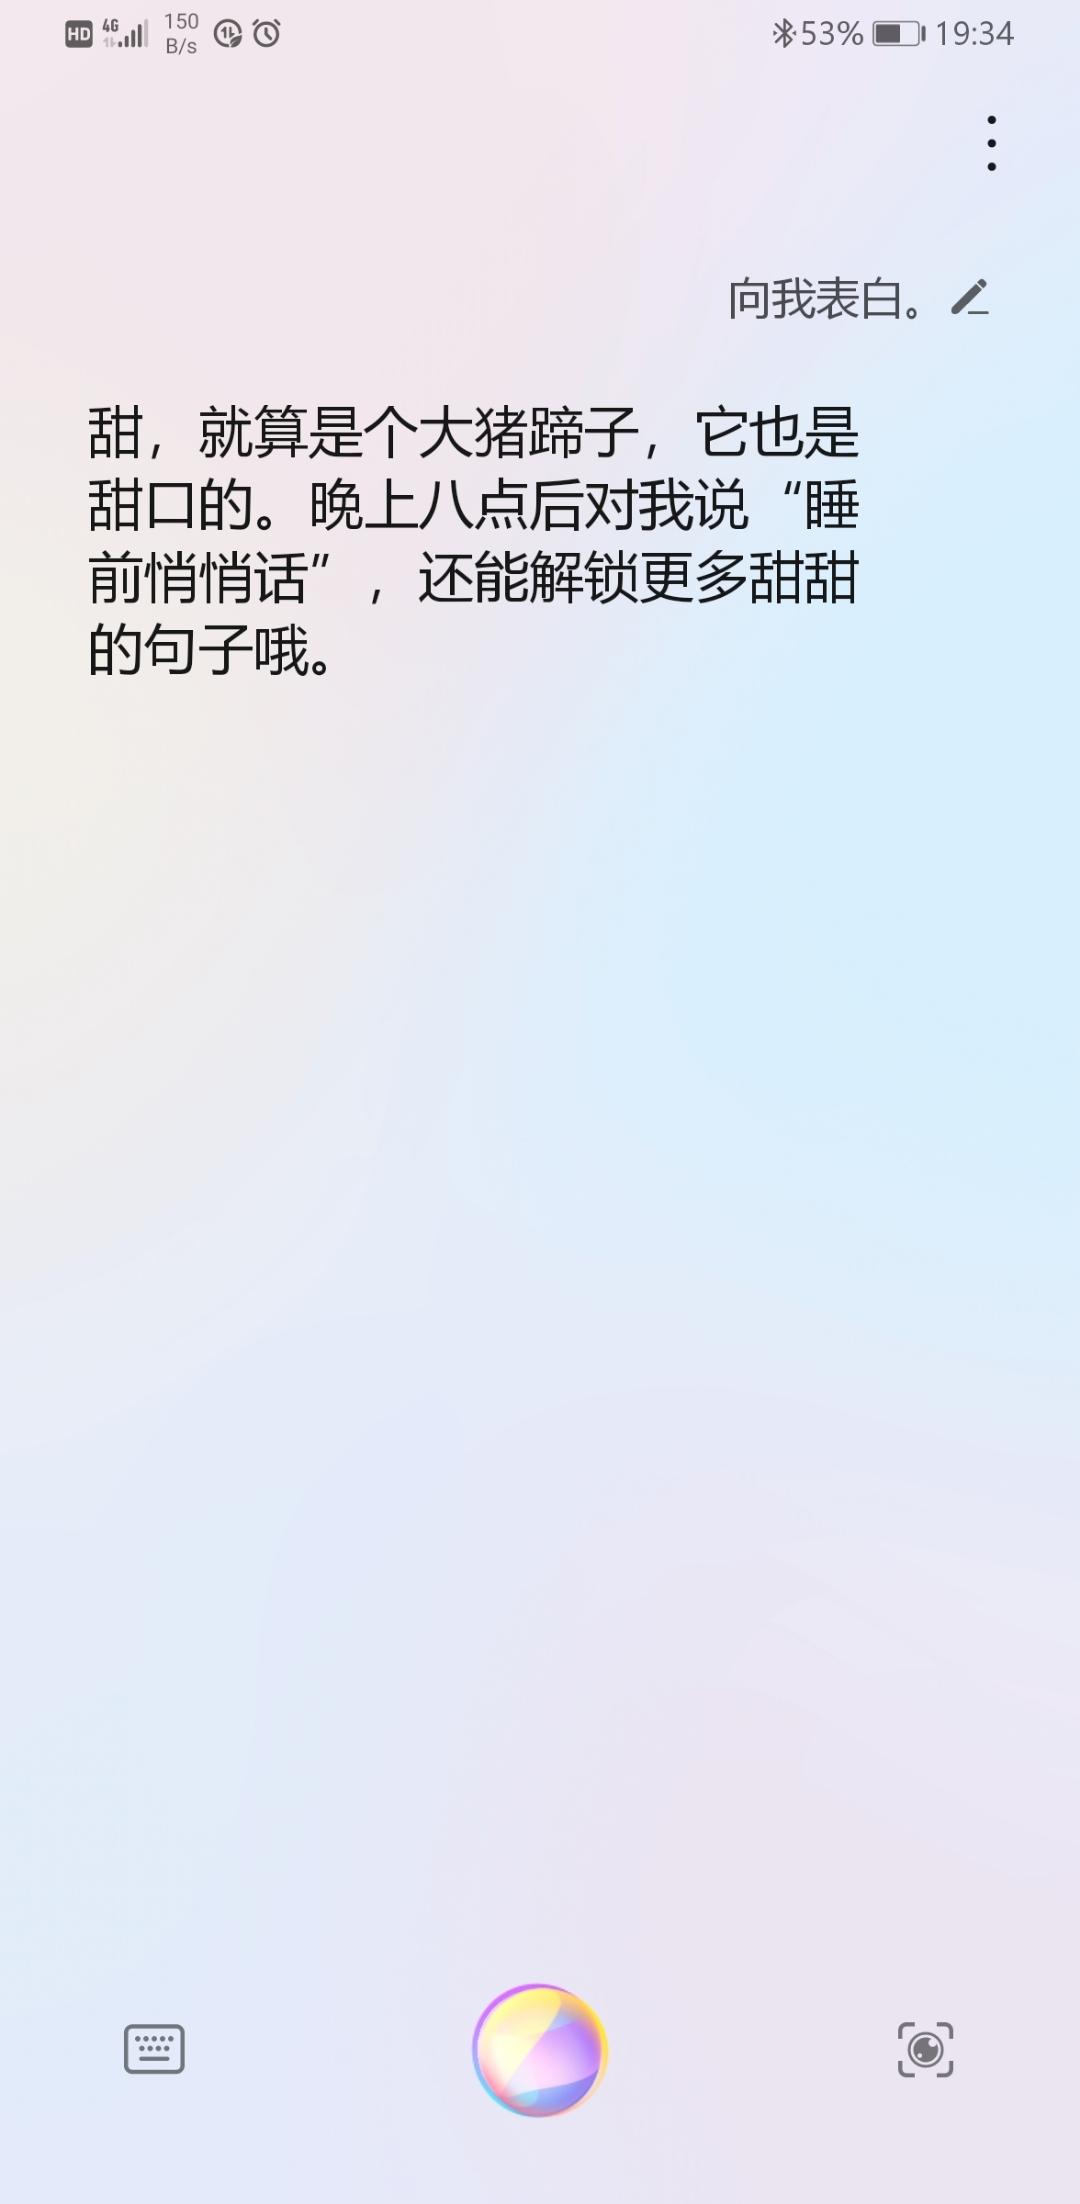 Screenshot_20210422_193433_com.huawei.vassistant.jpg